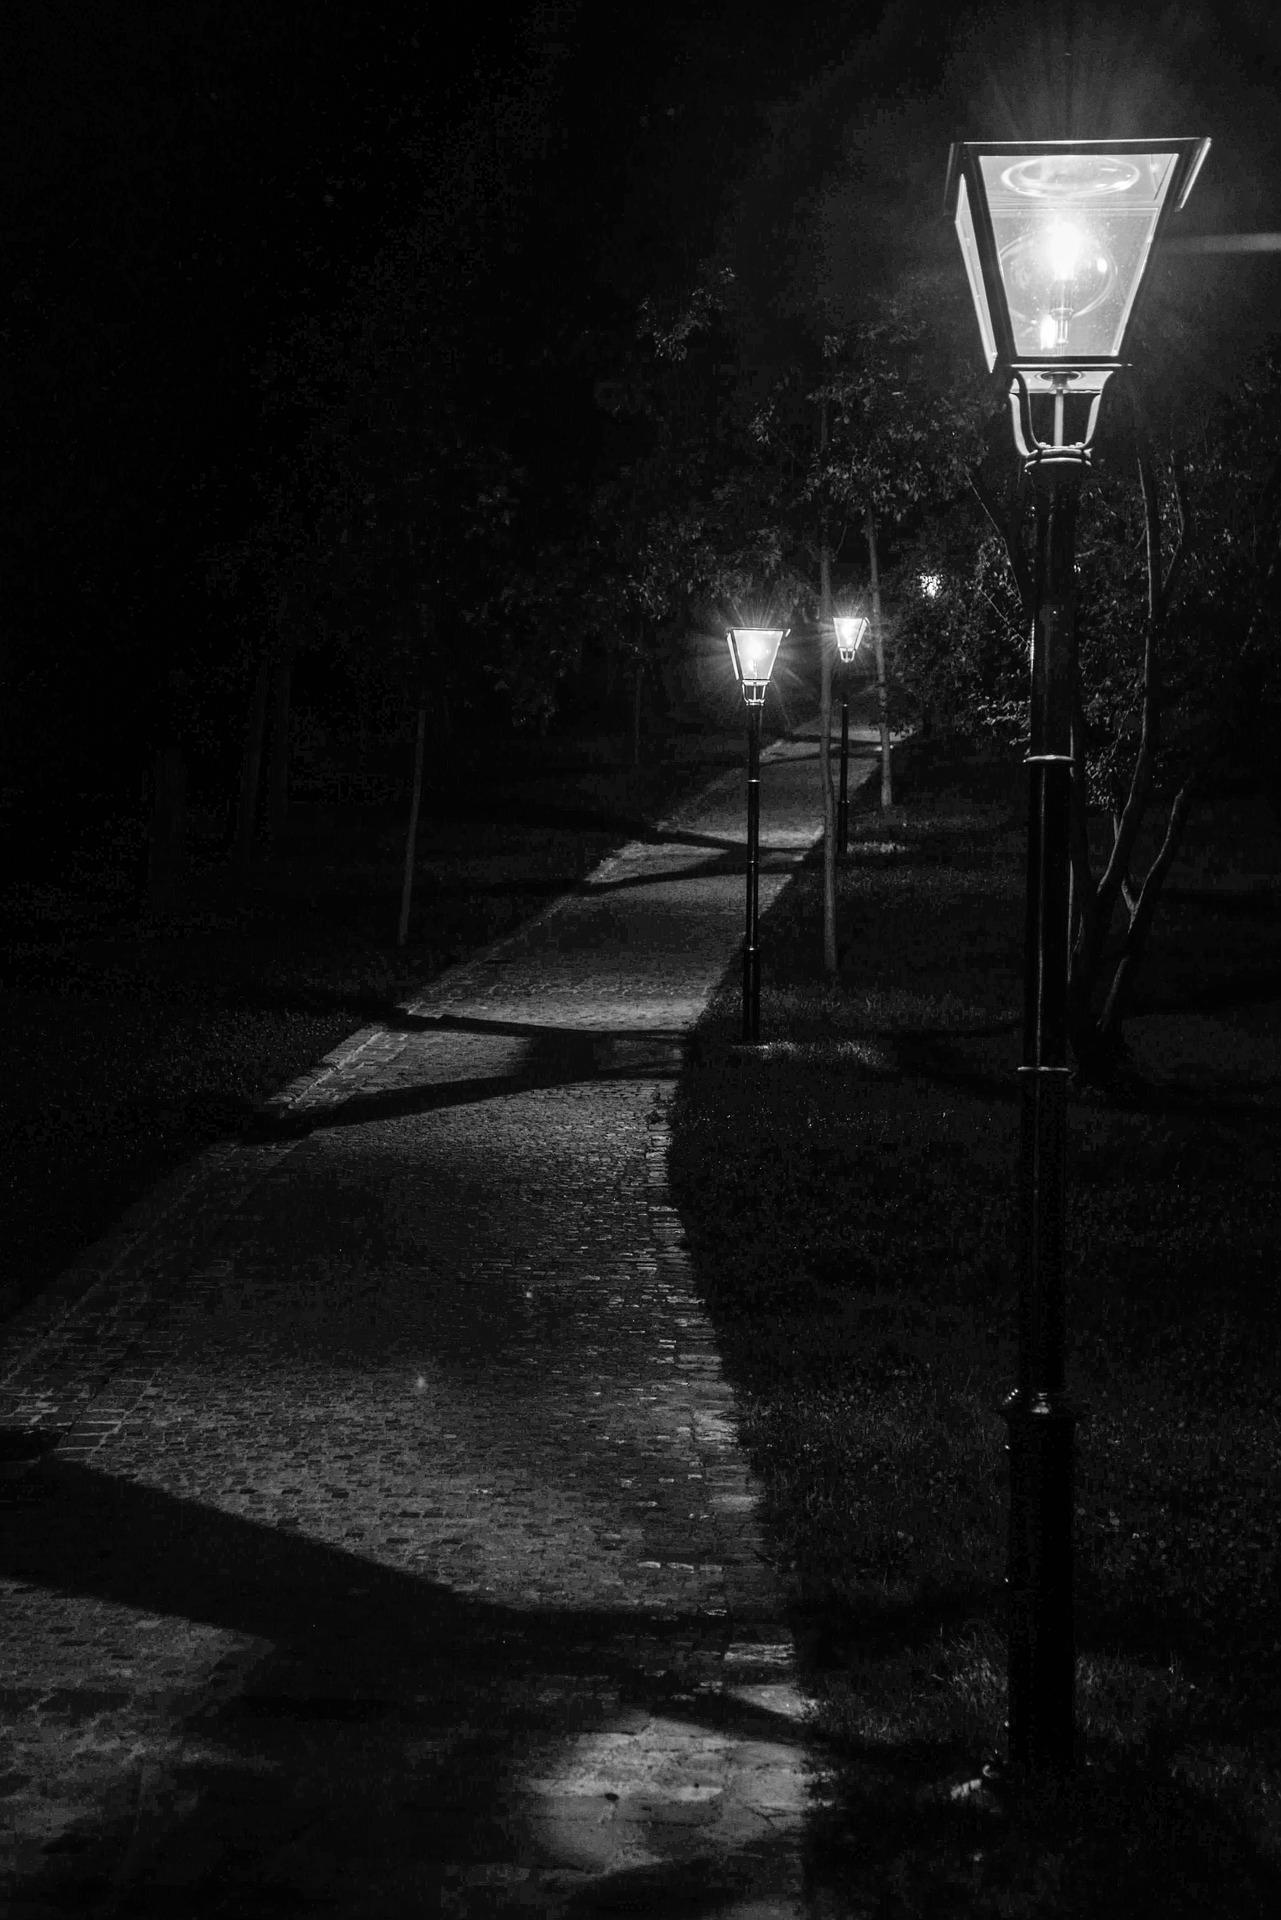 Image of a dark path